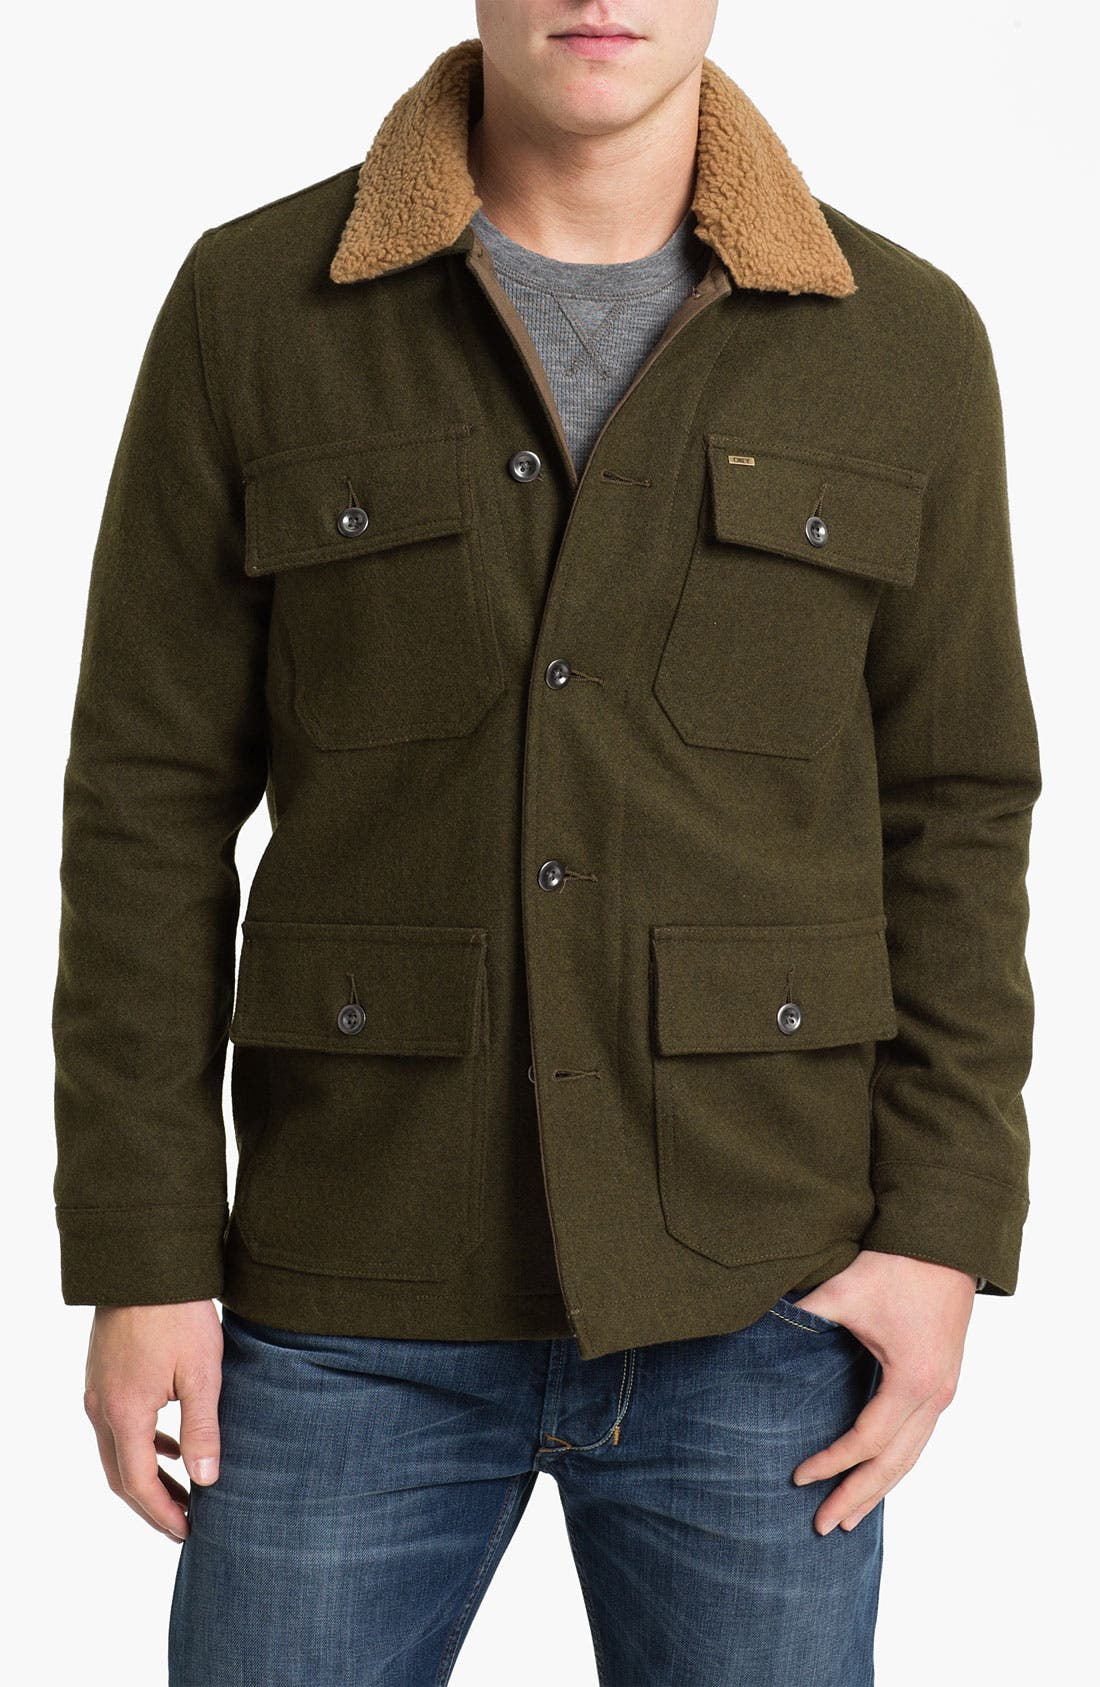 Main Image - Obey 'Winston' Wool Workwear Jacket